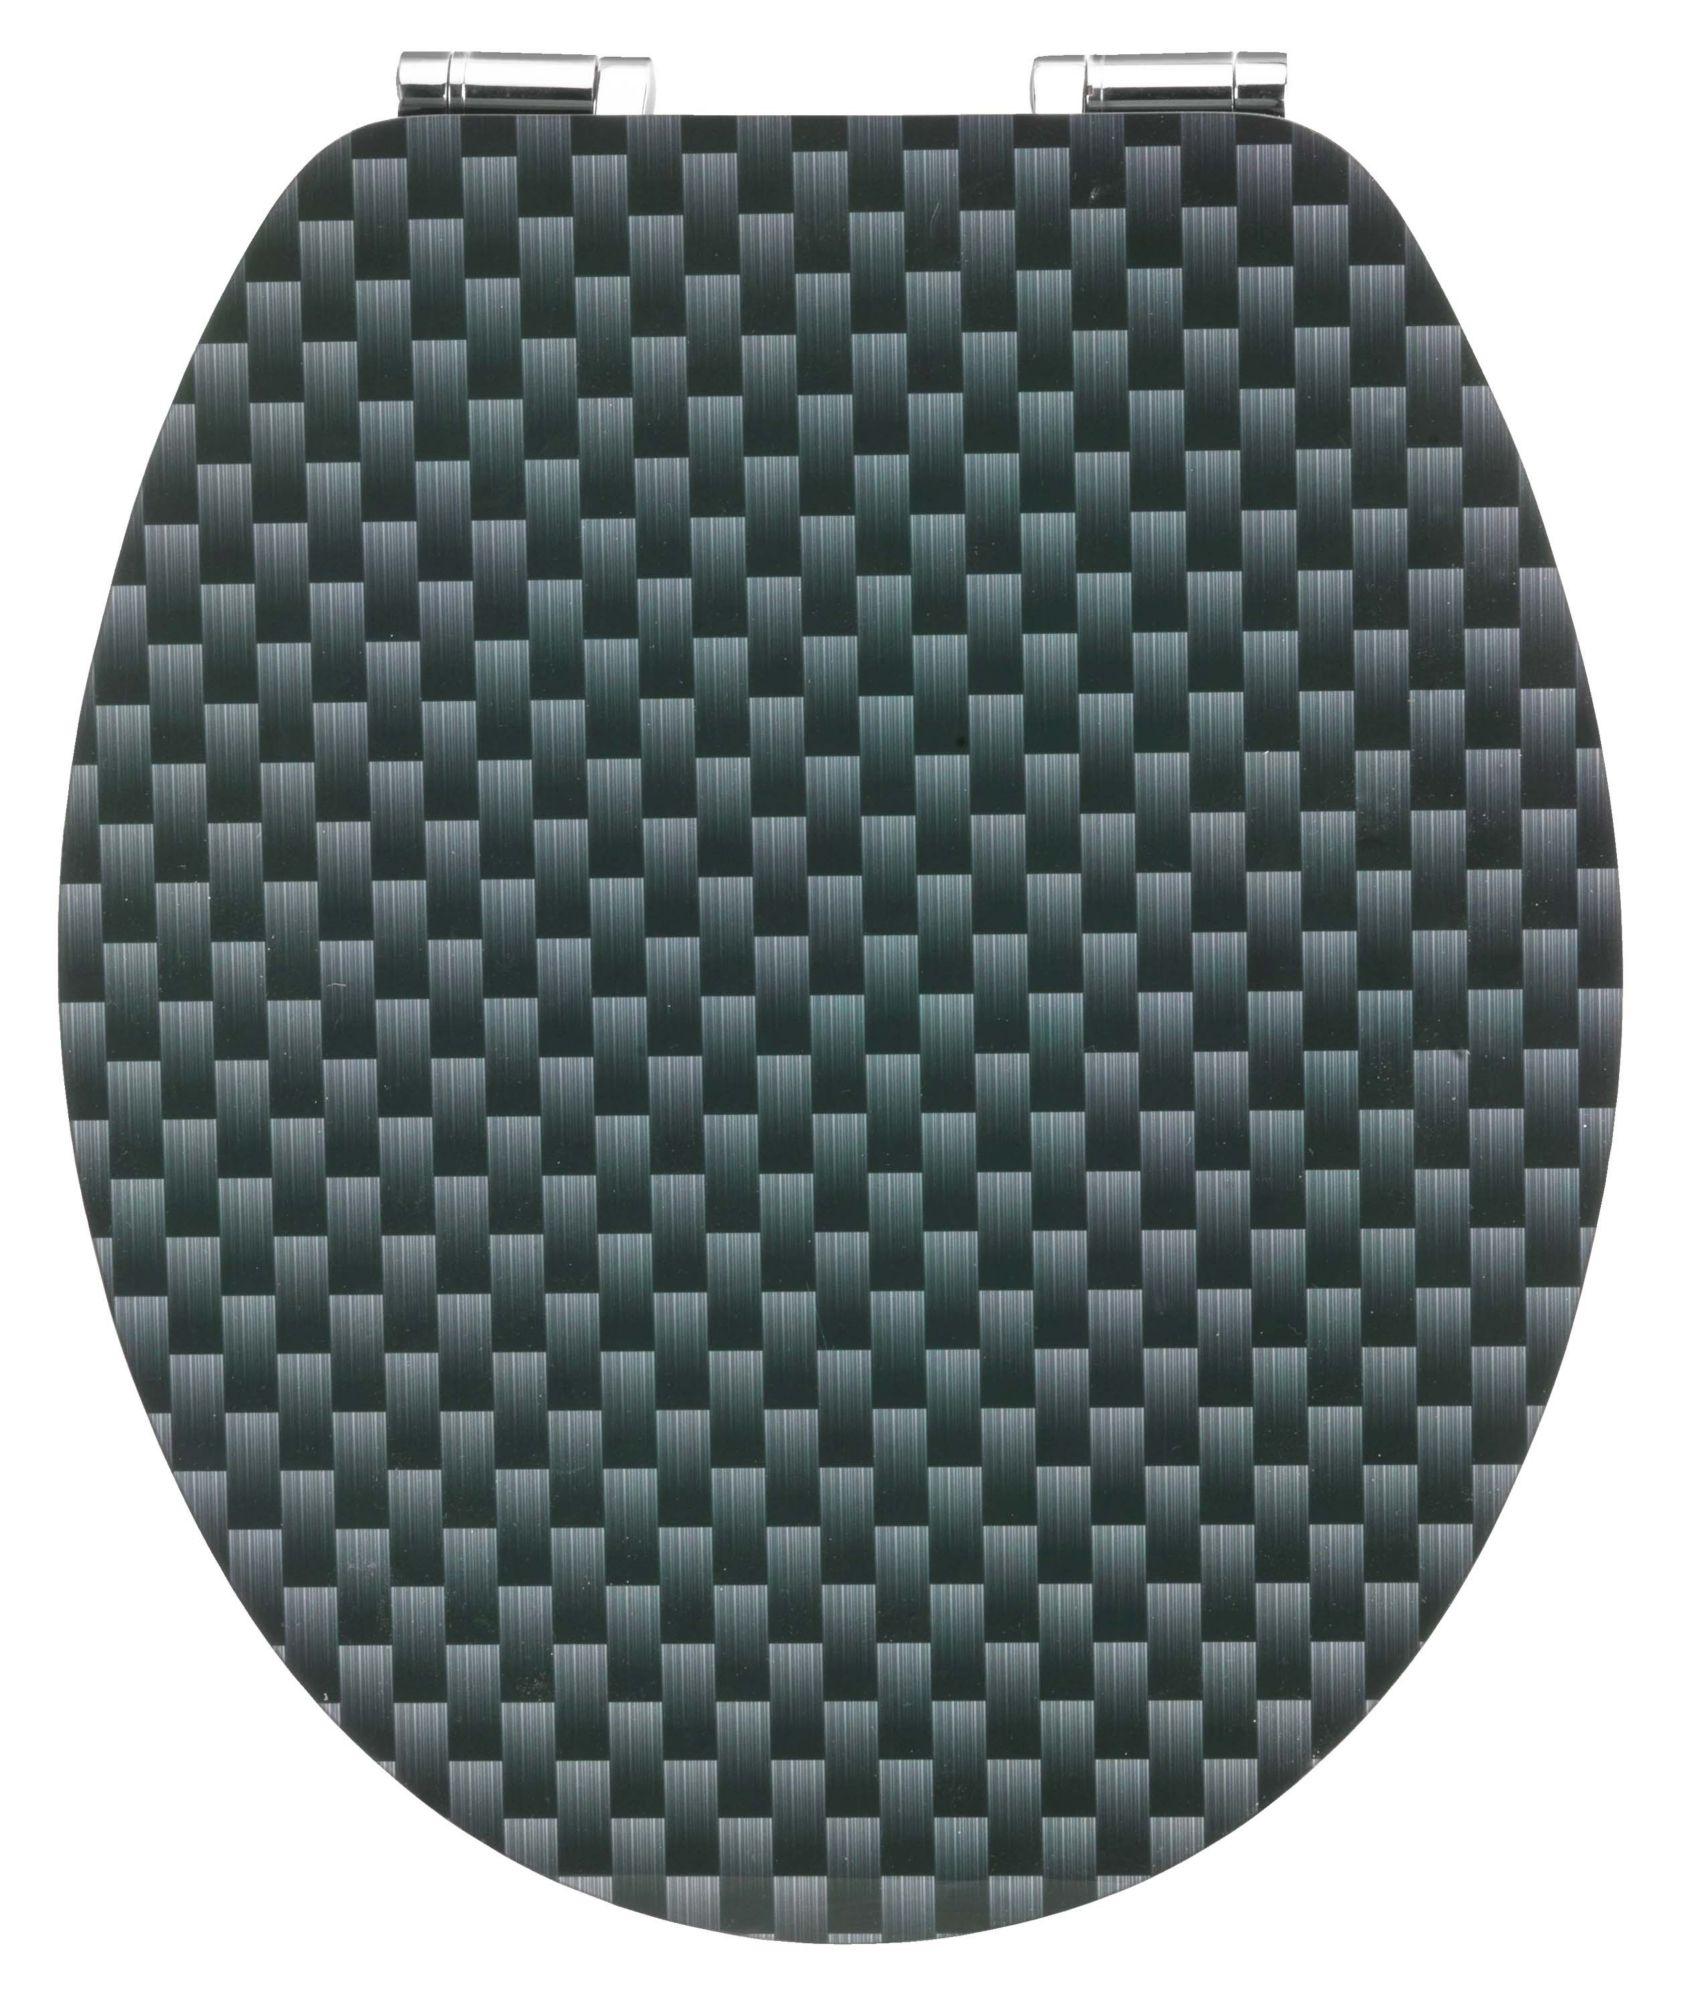 CORNAT Cornat WC-Sitz »Carbon«, Mit Absenkautomatik